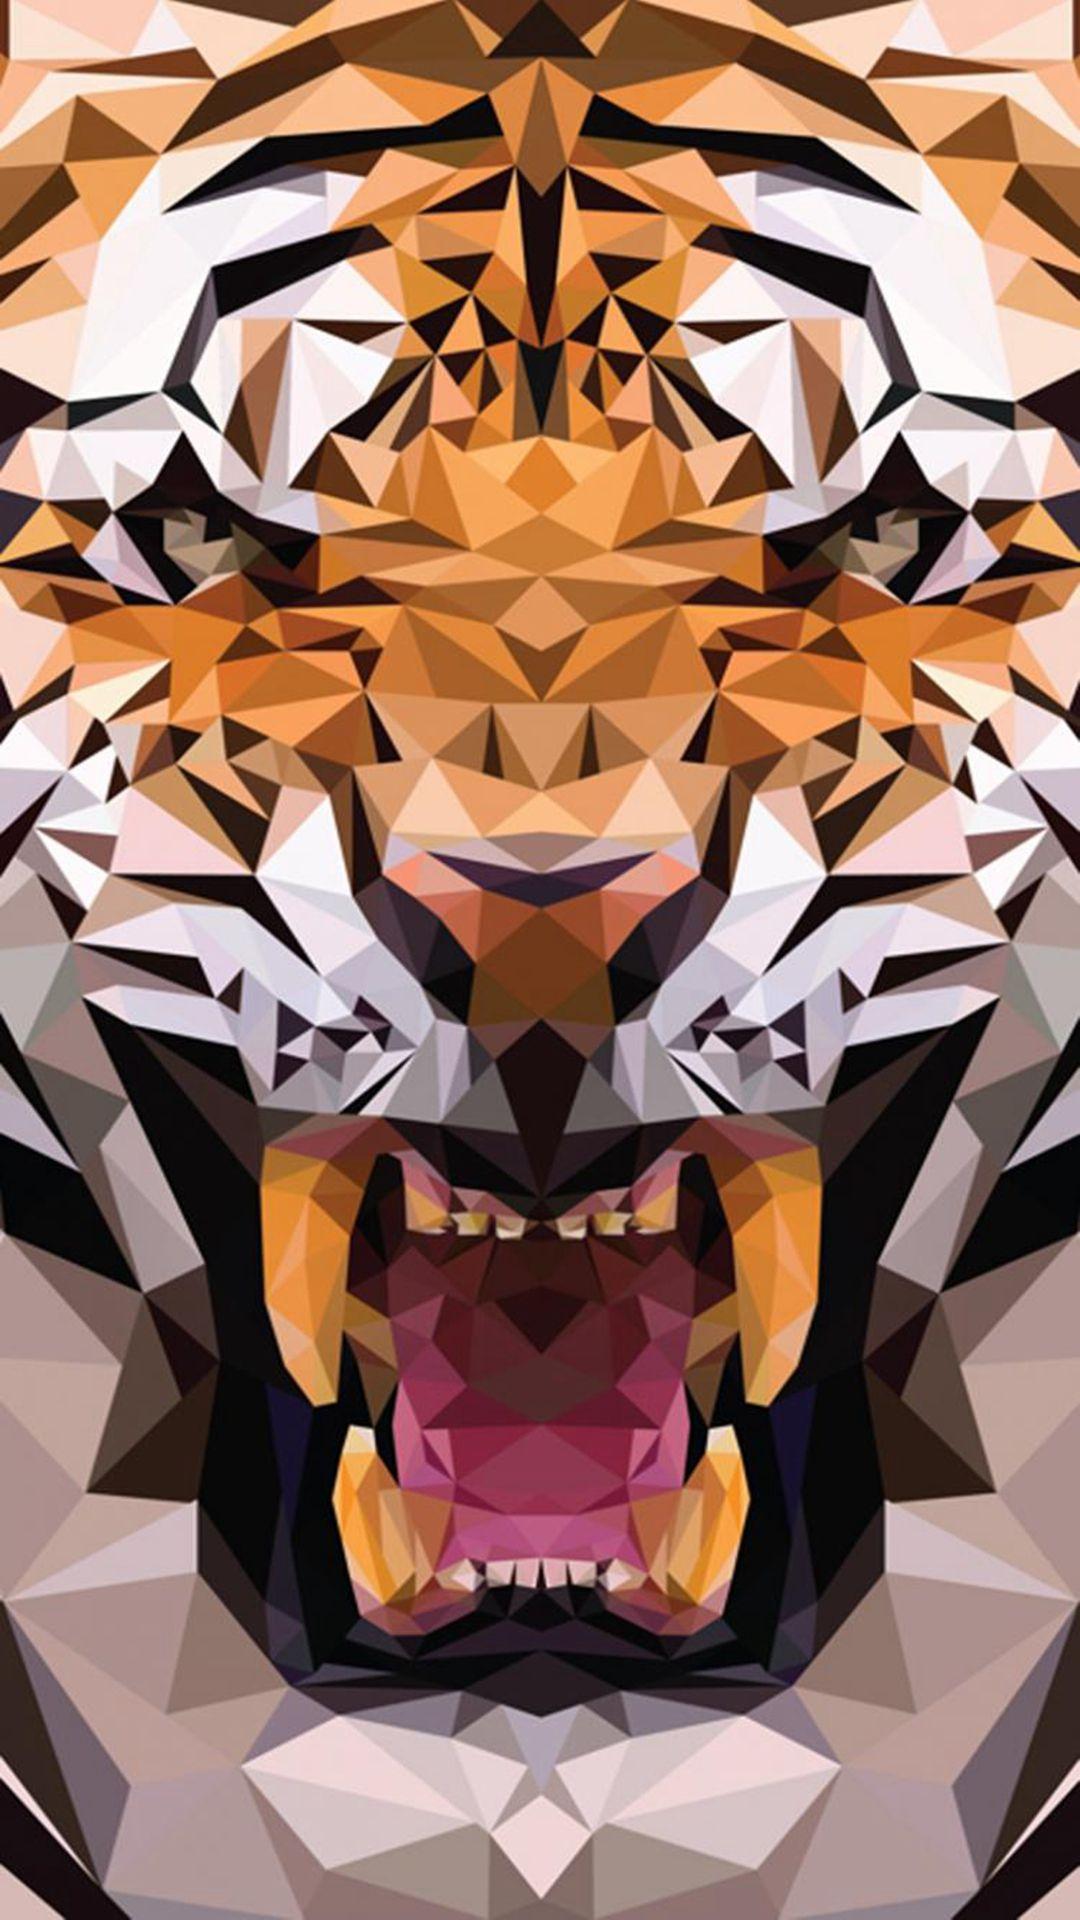 Wallpaper iphone 6 xman - Ios8 Animals Tiger Polygon Pattern Drawn Iphone 6 Plus Wallpaper